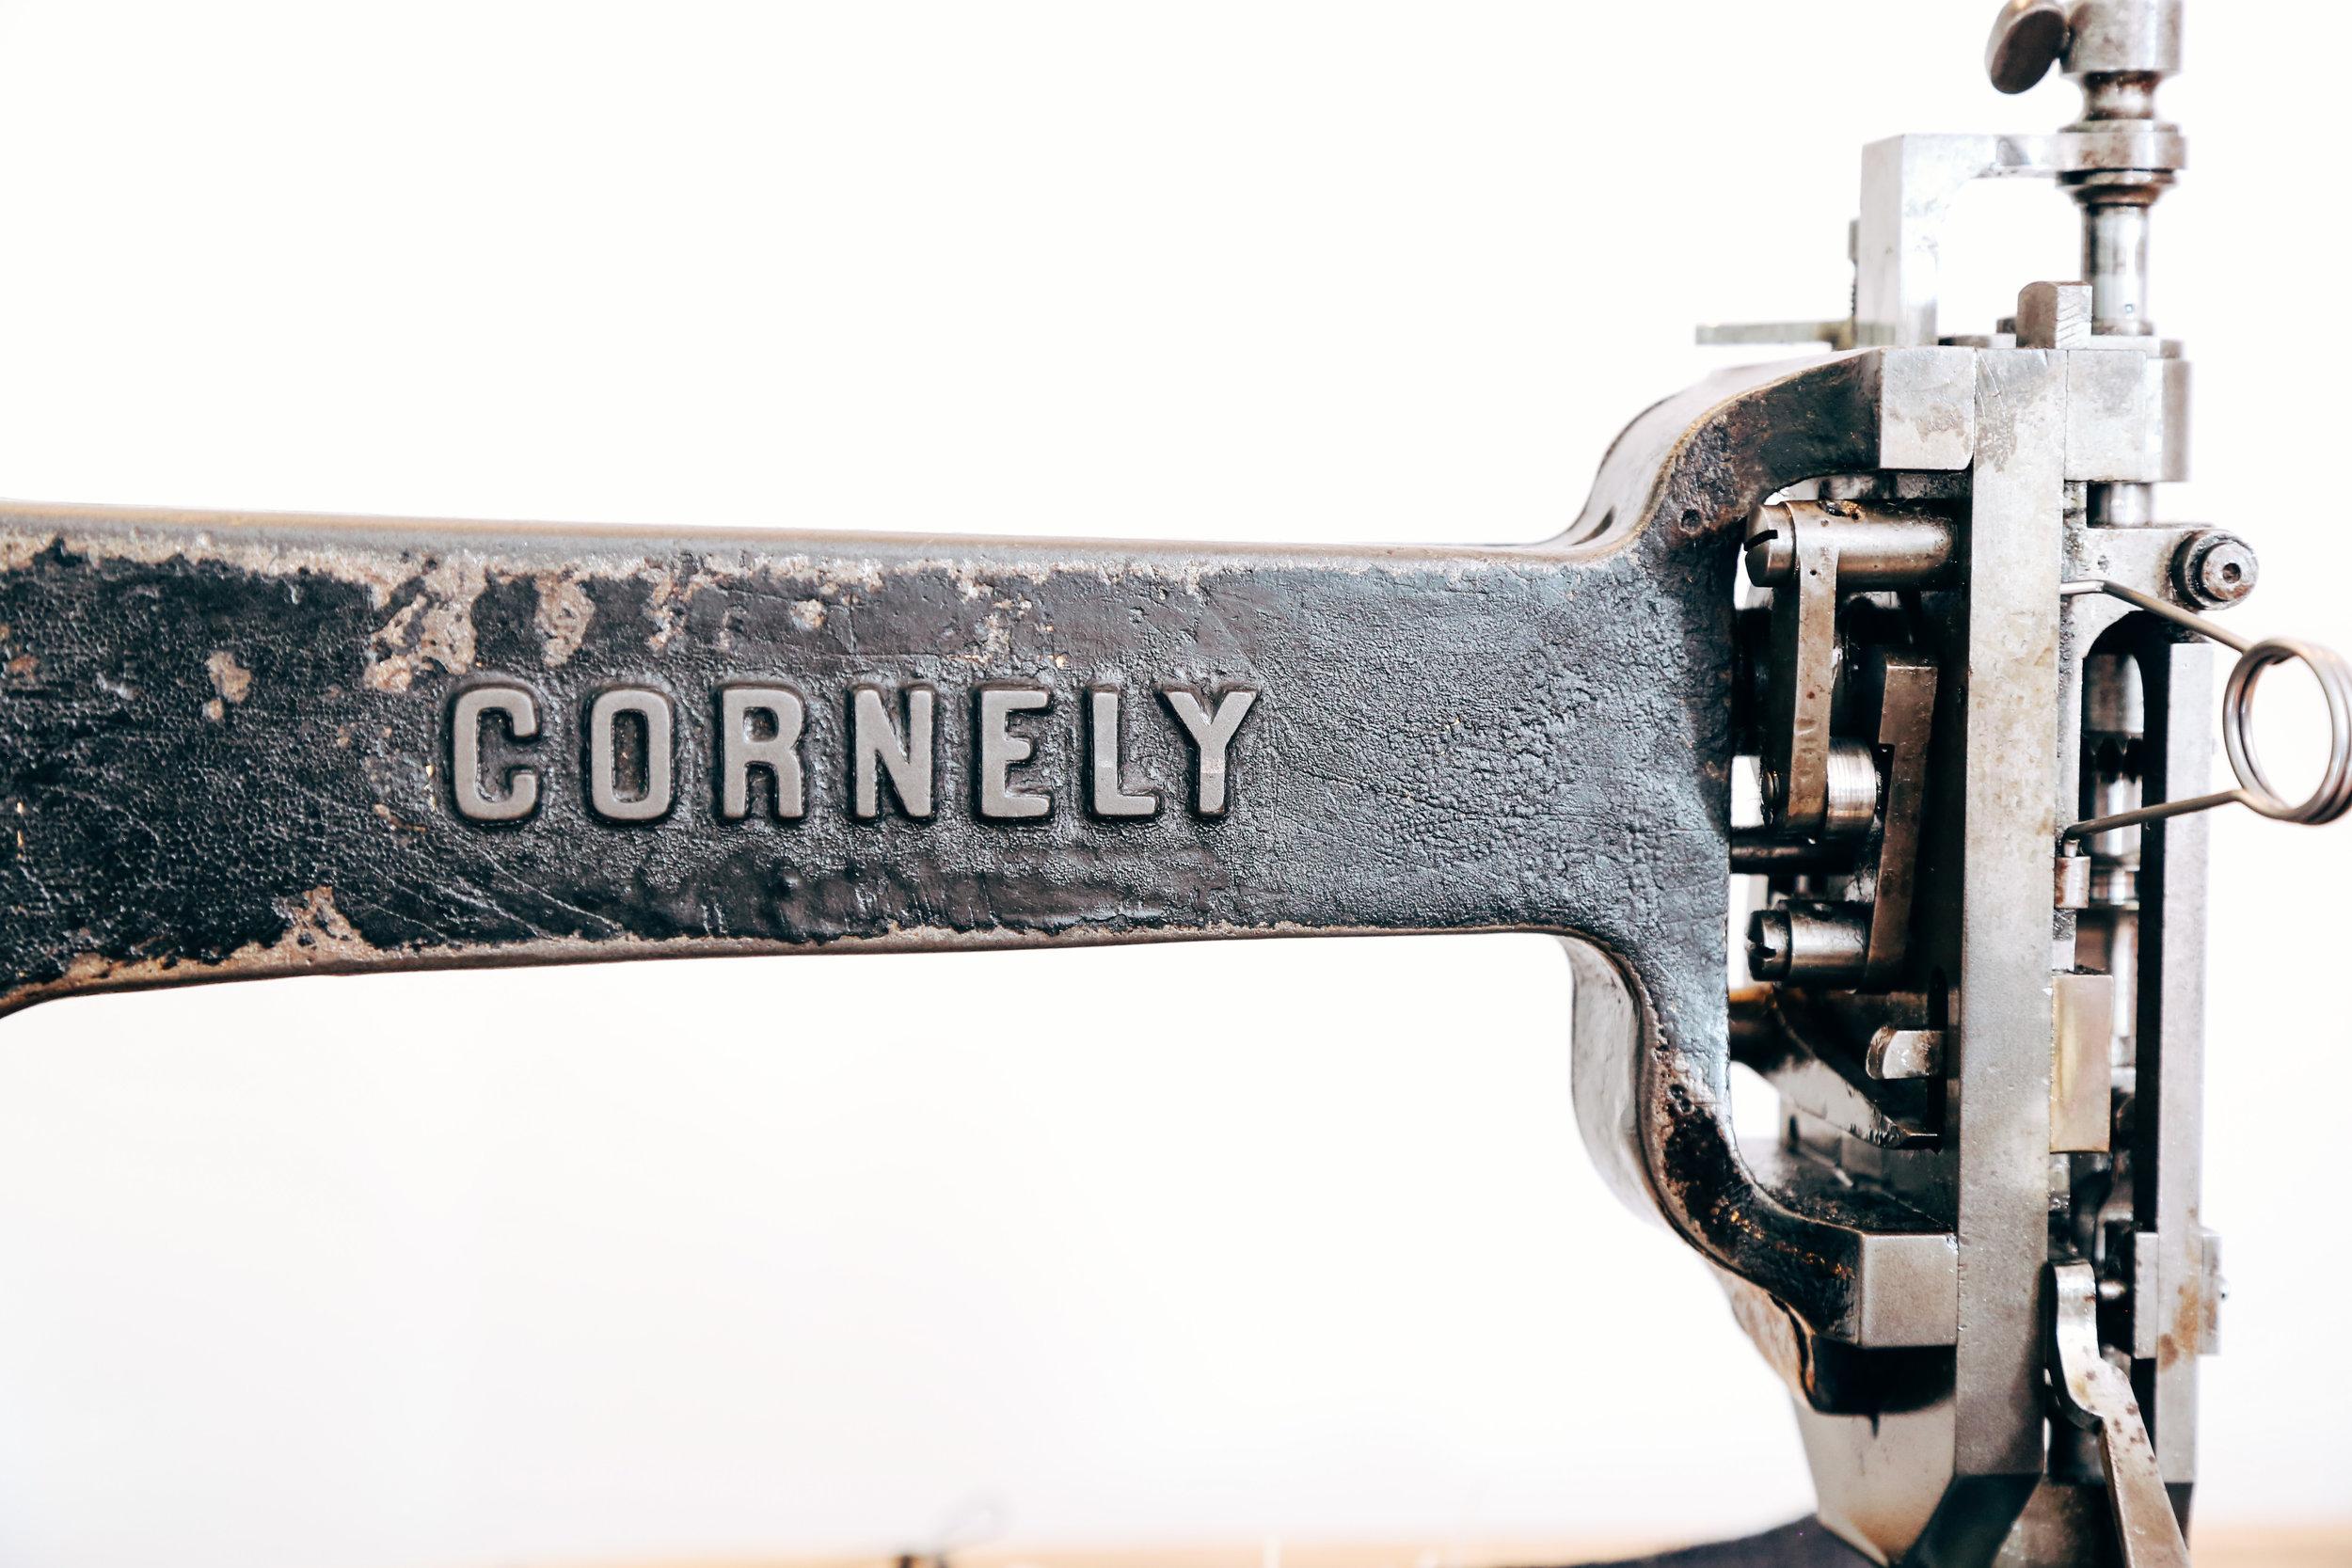 cornely-closup-a-chain-stitch-machine-singer-114w013-lintz-eckhardt.jpg